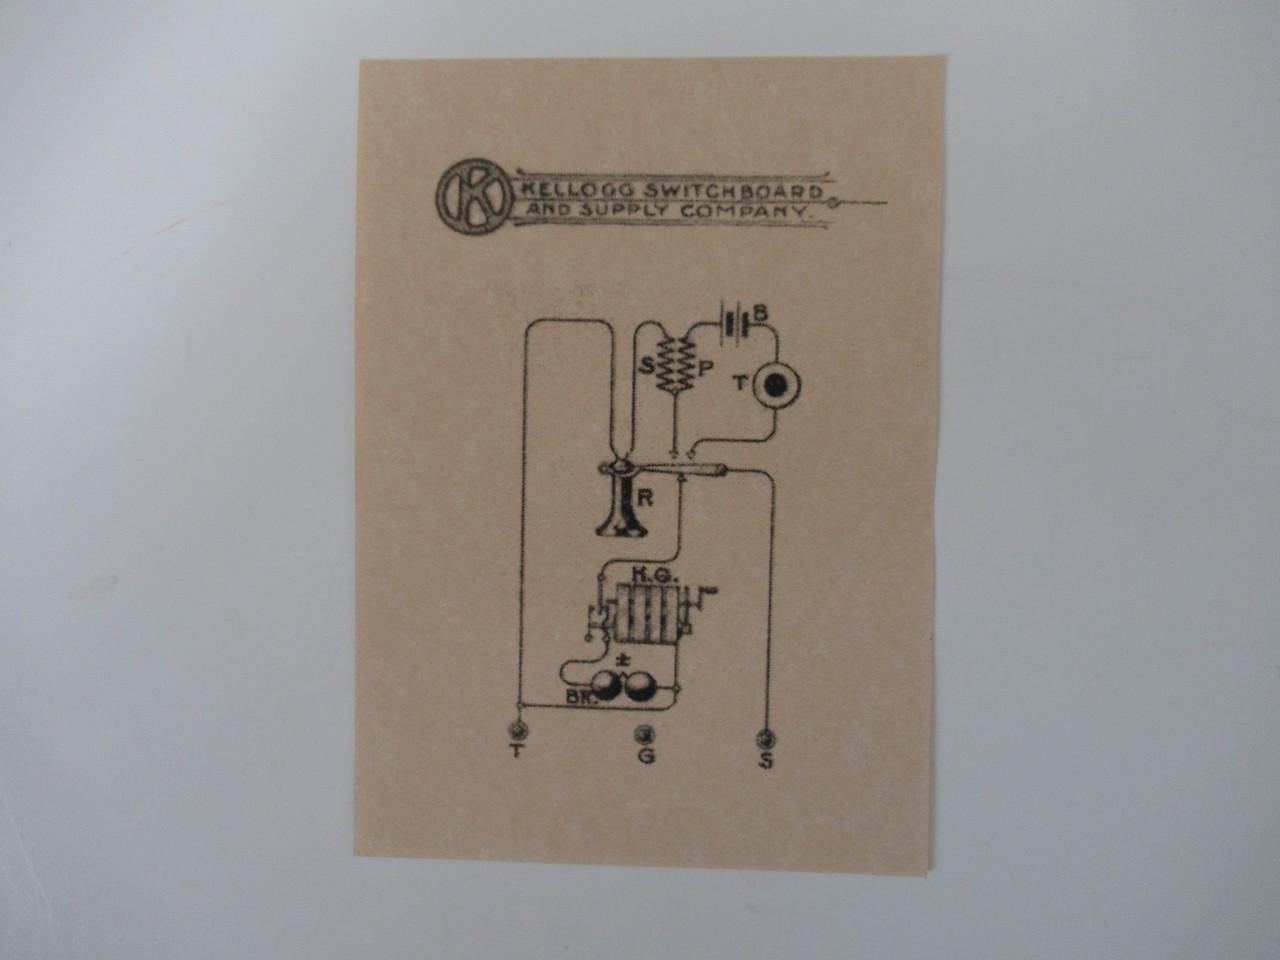 Kellogg Telephone Wiring Diagram from cdn2.bigcommerce.com